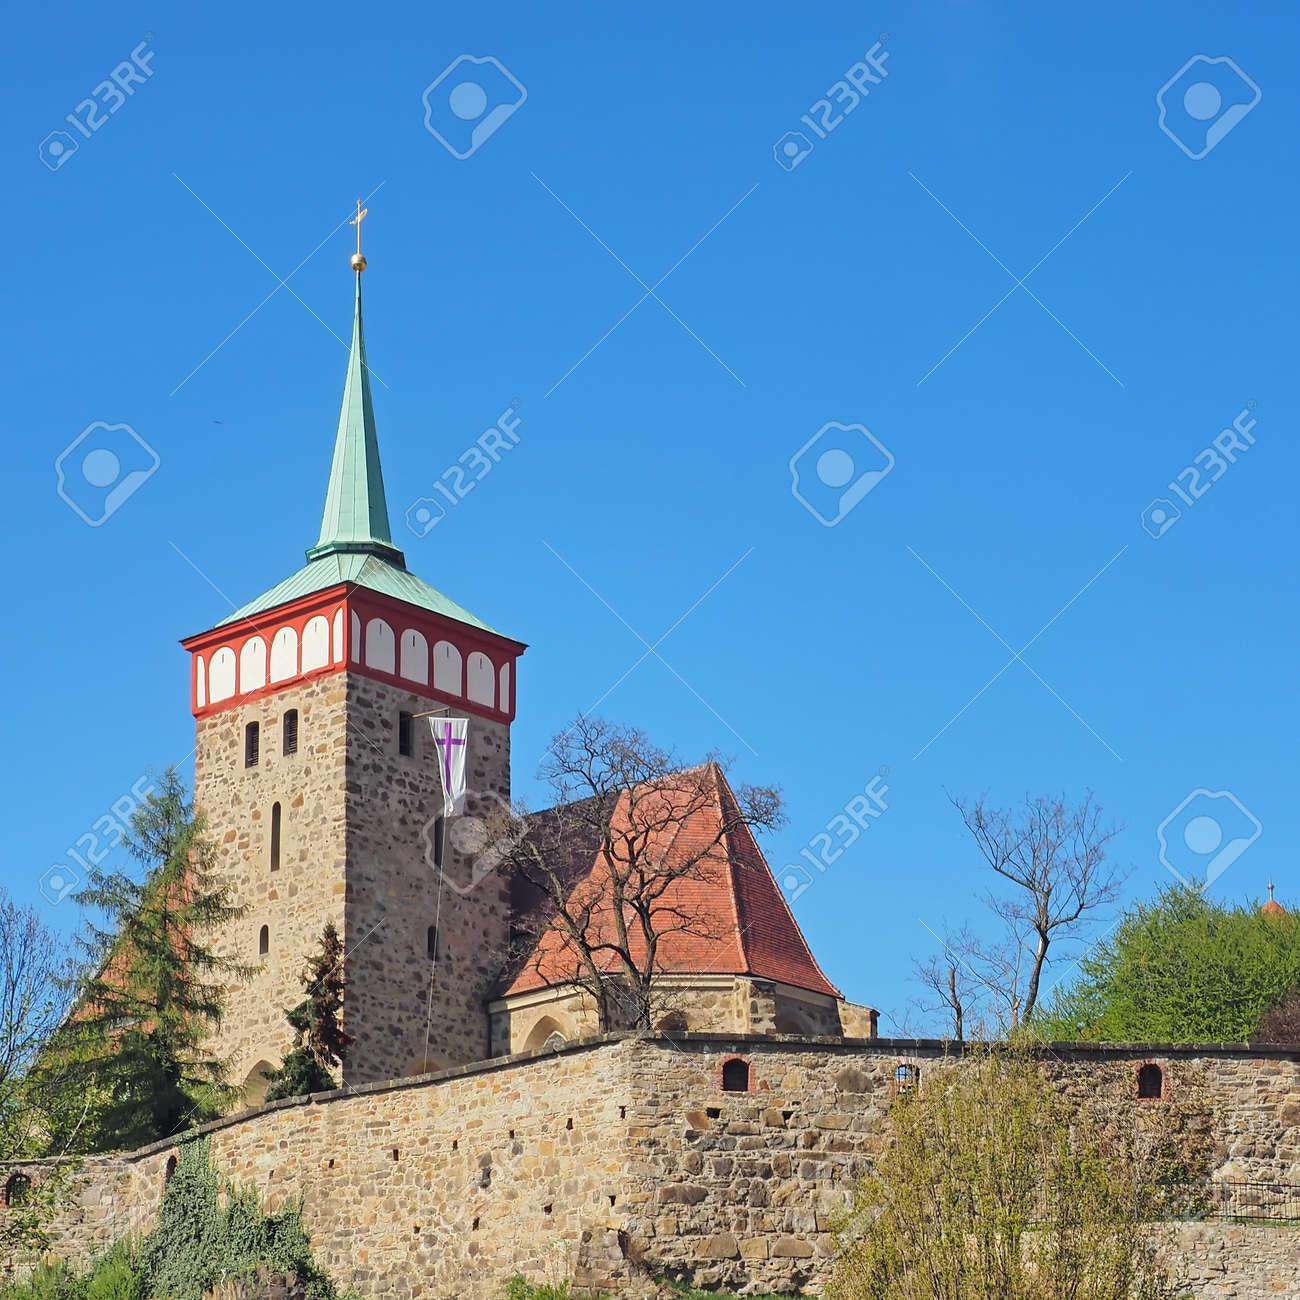 Church of St. Michael in city Bautzen, Saxony, Germany - 151902396